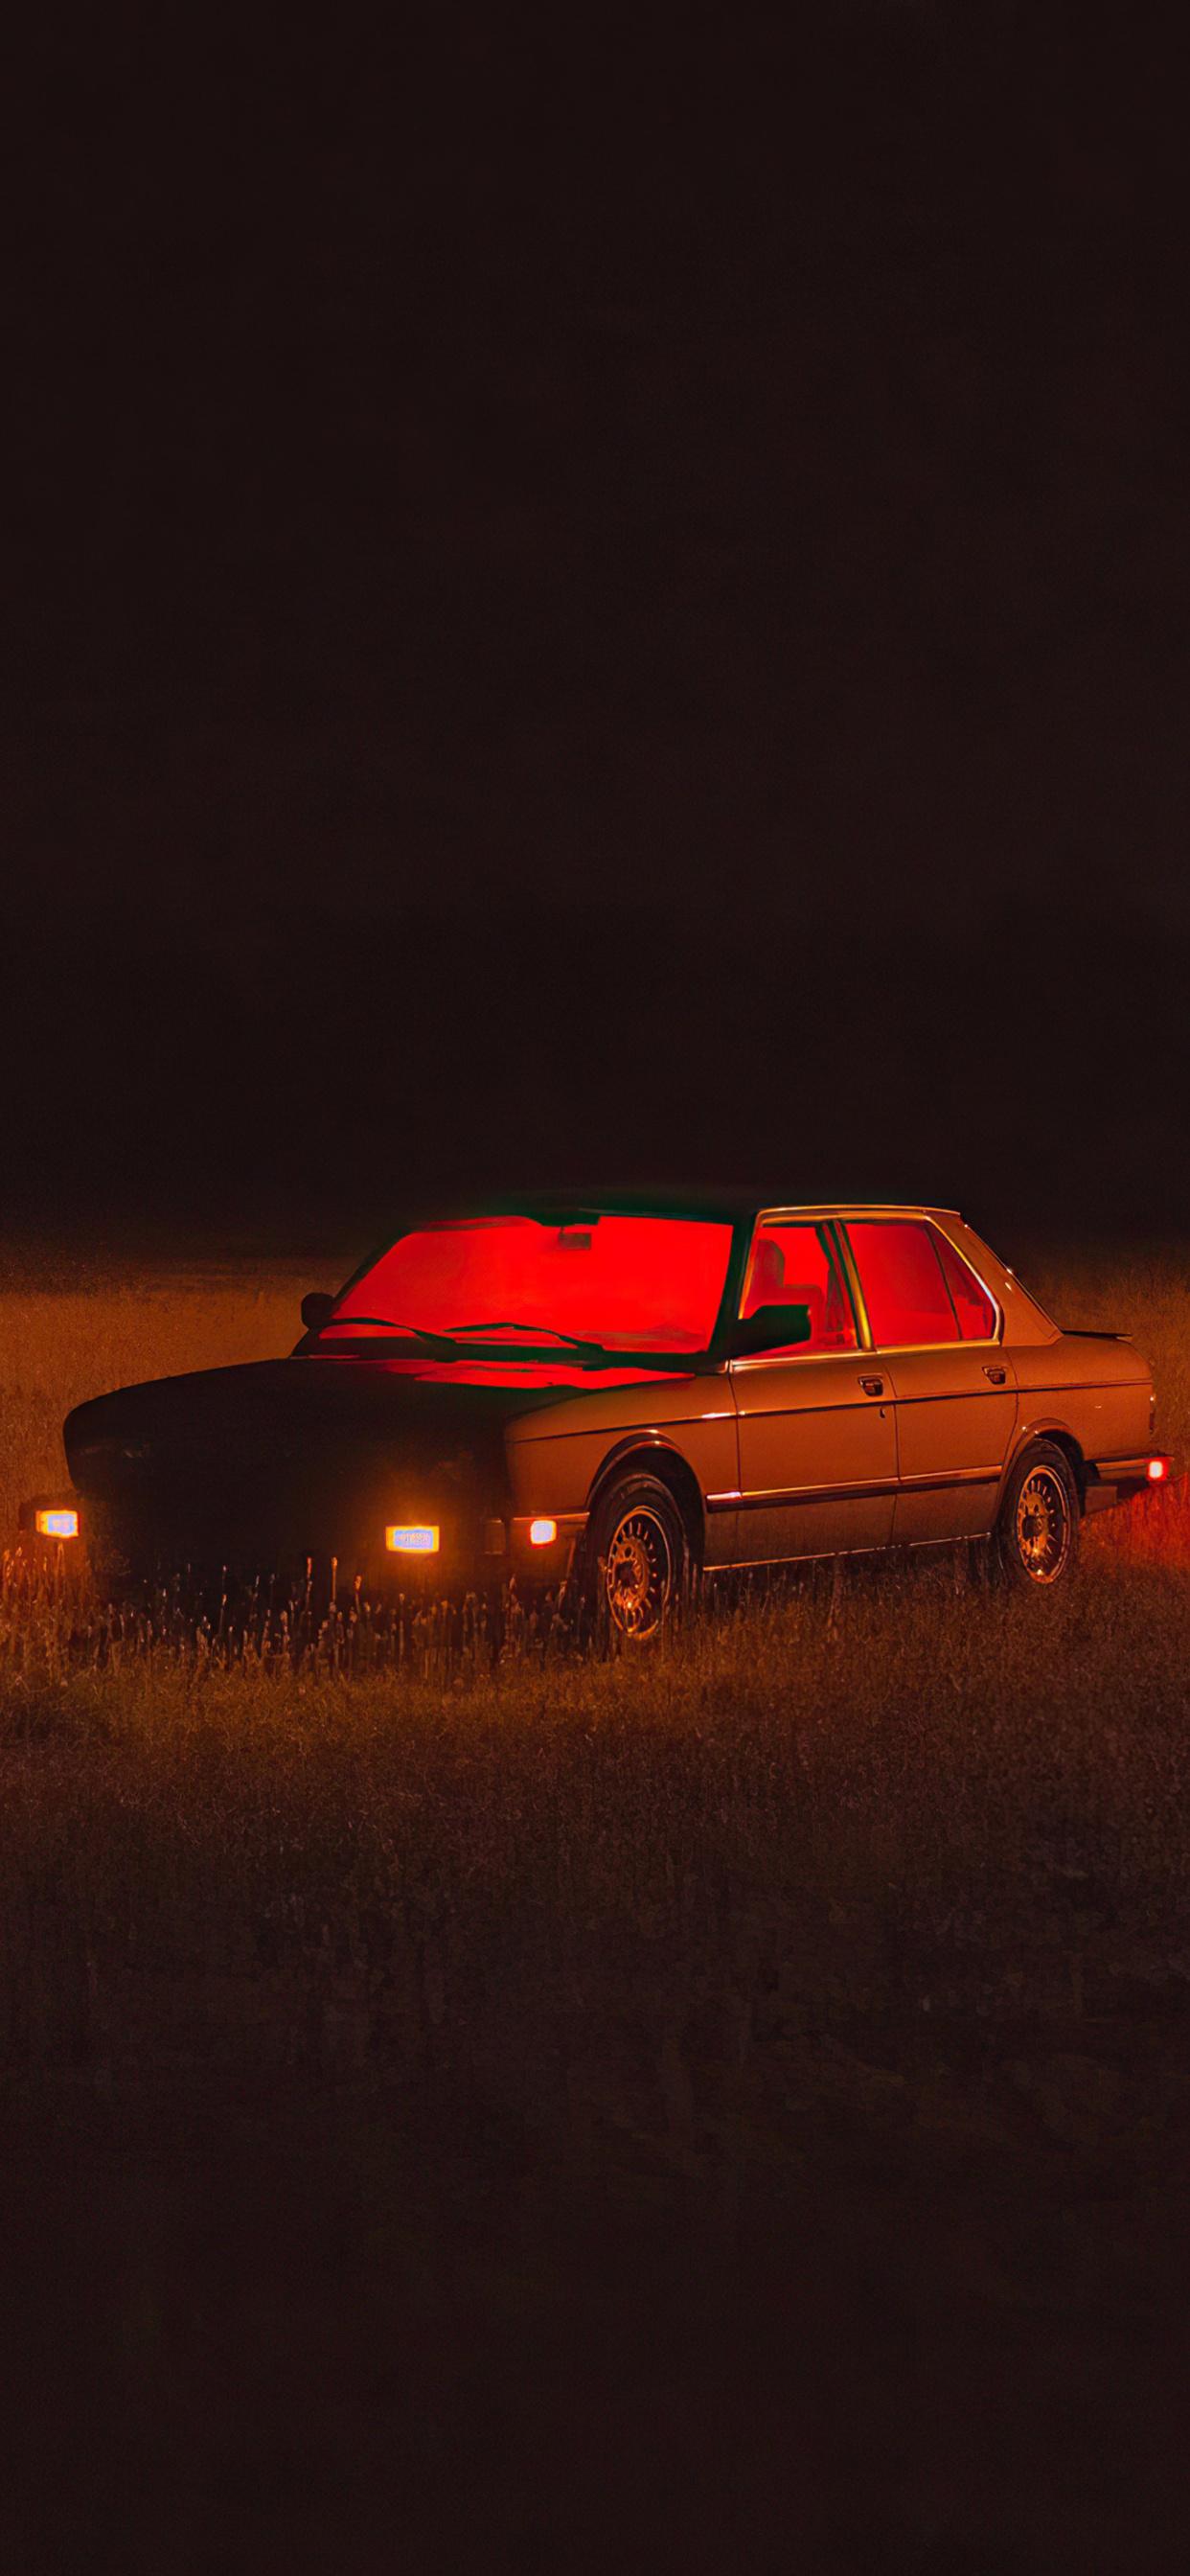 car-night-field-dark-4k-u9.jpg